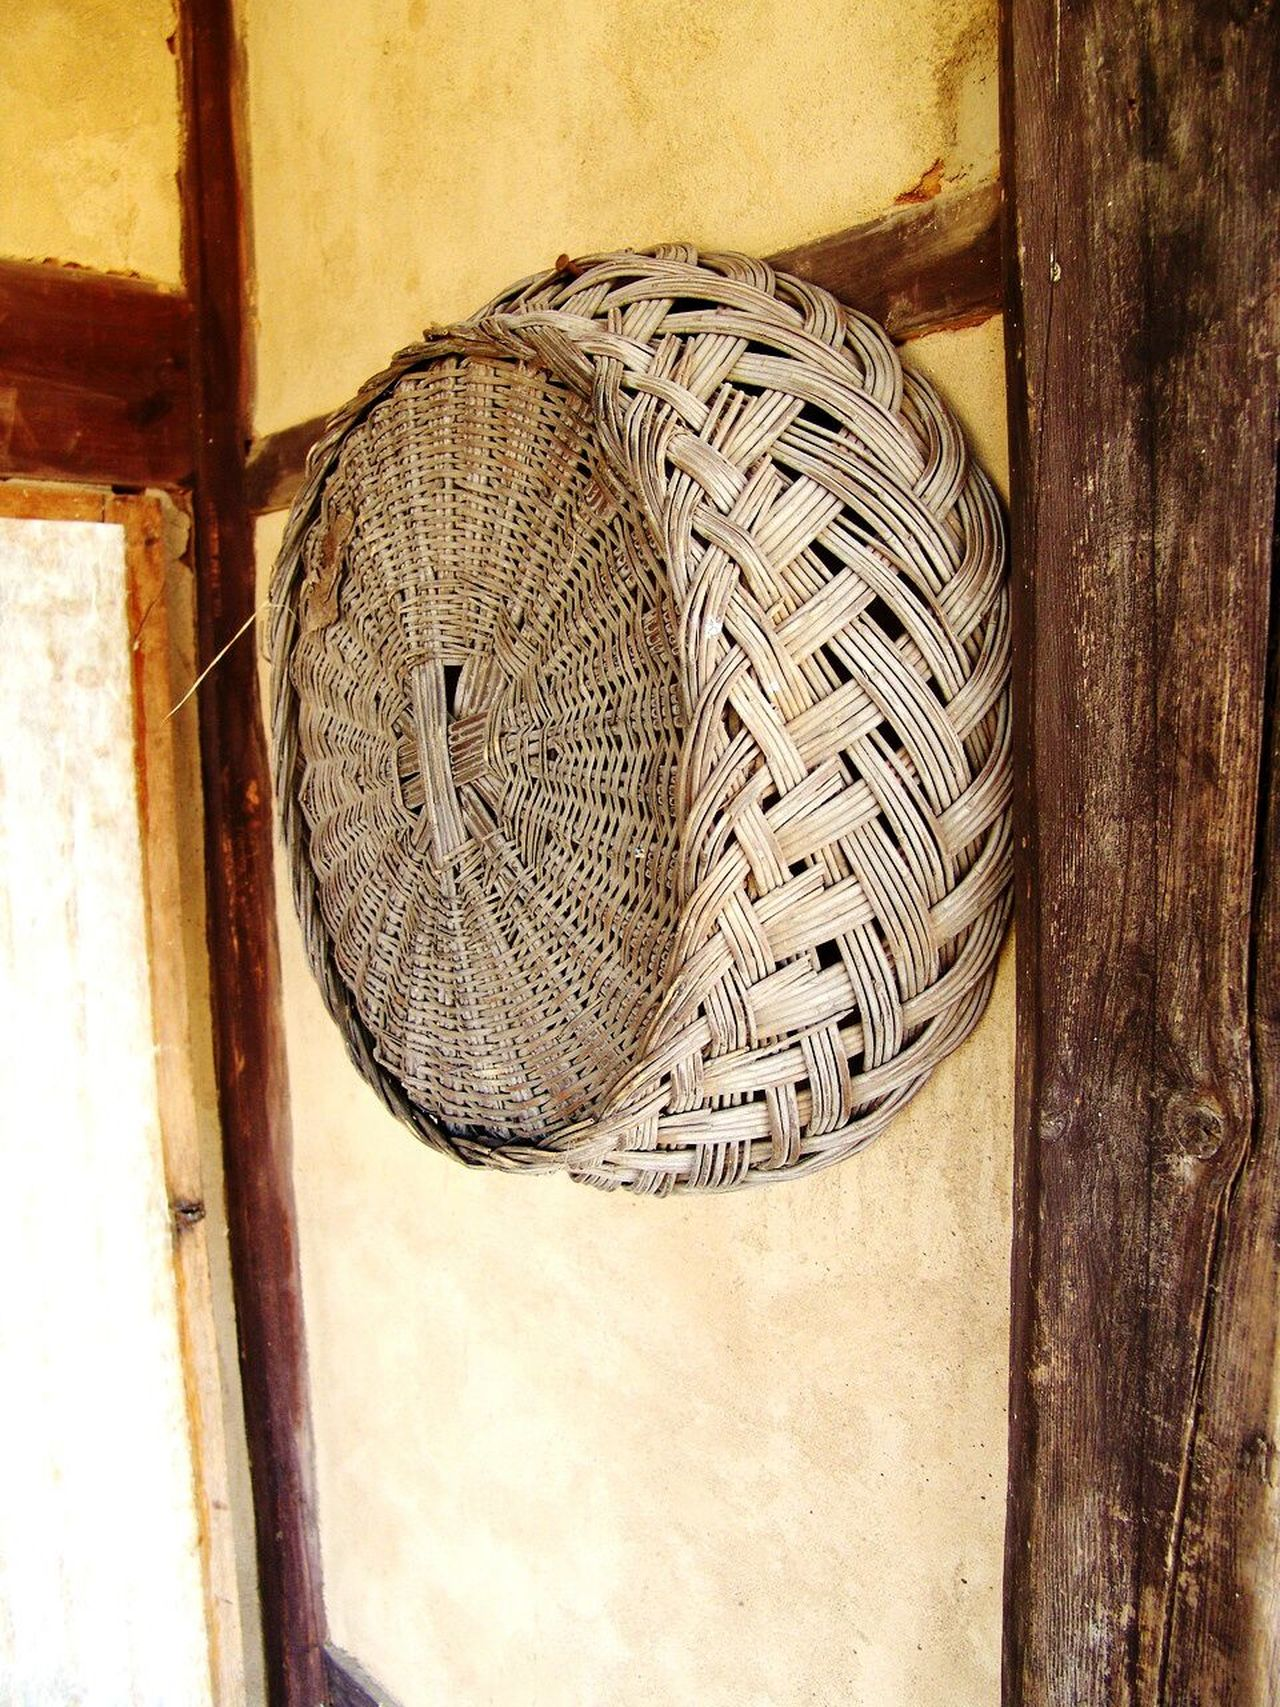 No People Day Indoors  Close-up Bamboo Basket Hand Made Hanging On Wall Wall Exterior Remote Place Huts Picnic Basket Bamboo - Material EyeEmNewHere EyeEmNewHere BYOPaper!